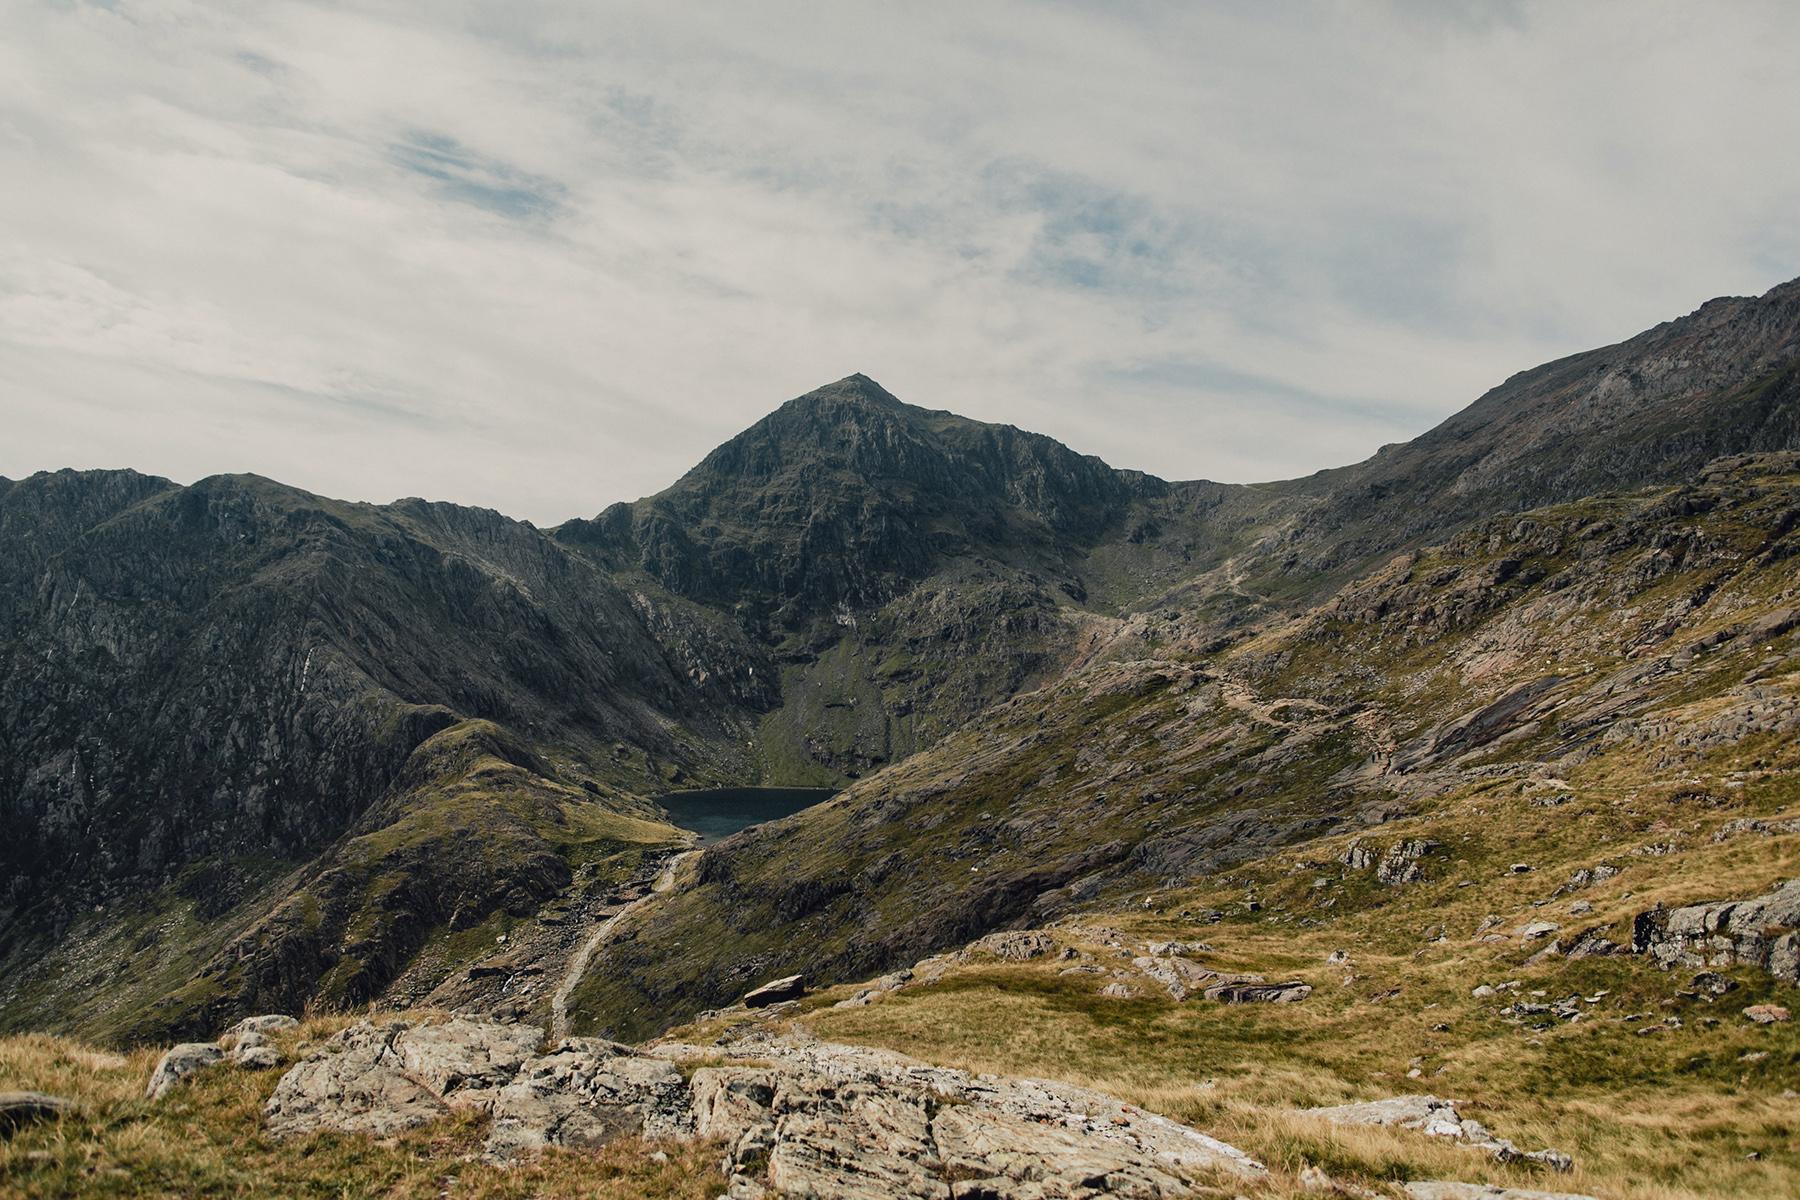 Mt-Snowdon-Hike-Photos-From-Peny-Pass-00101.jpg